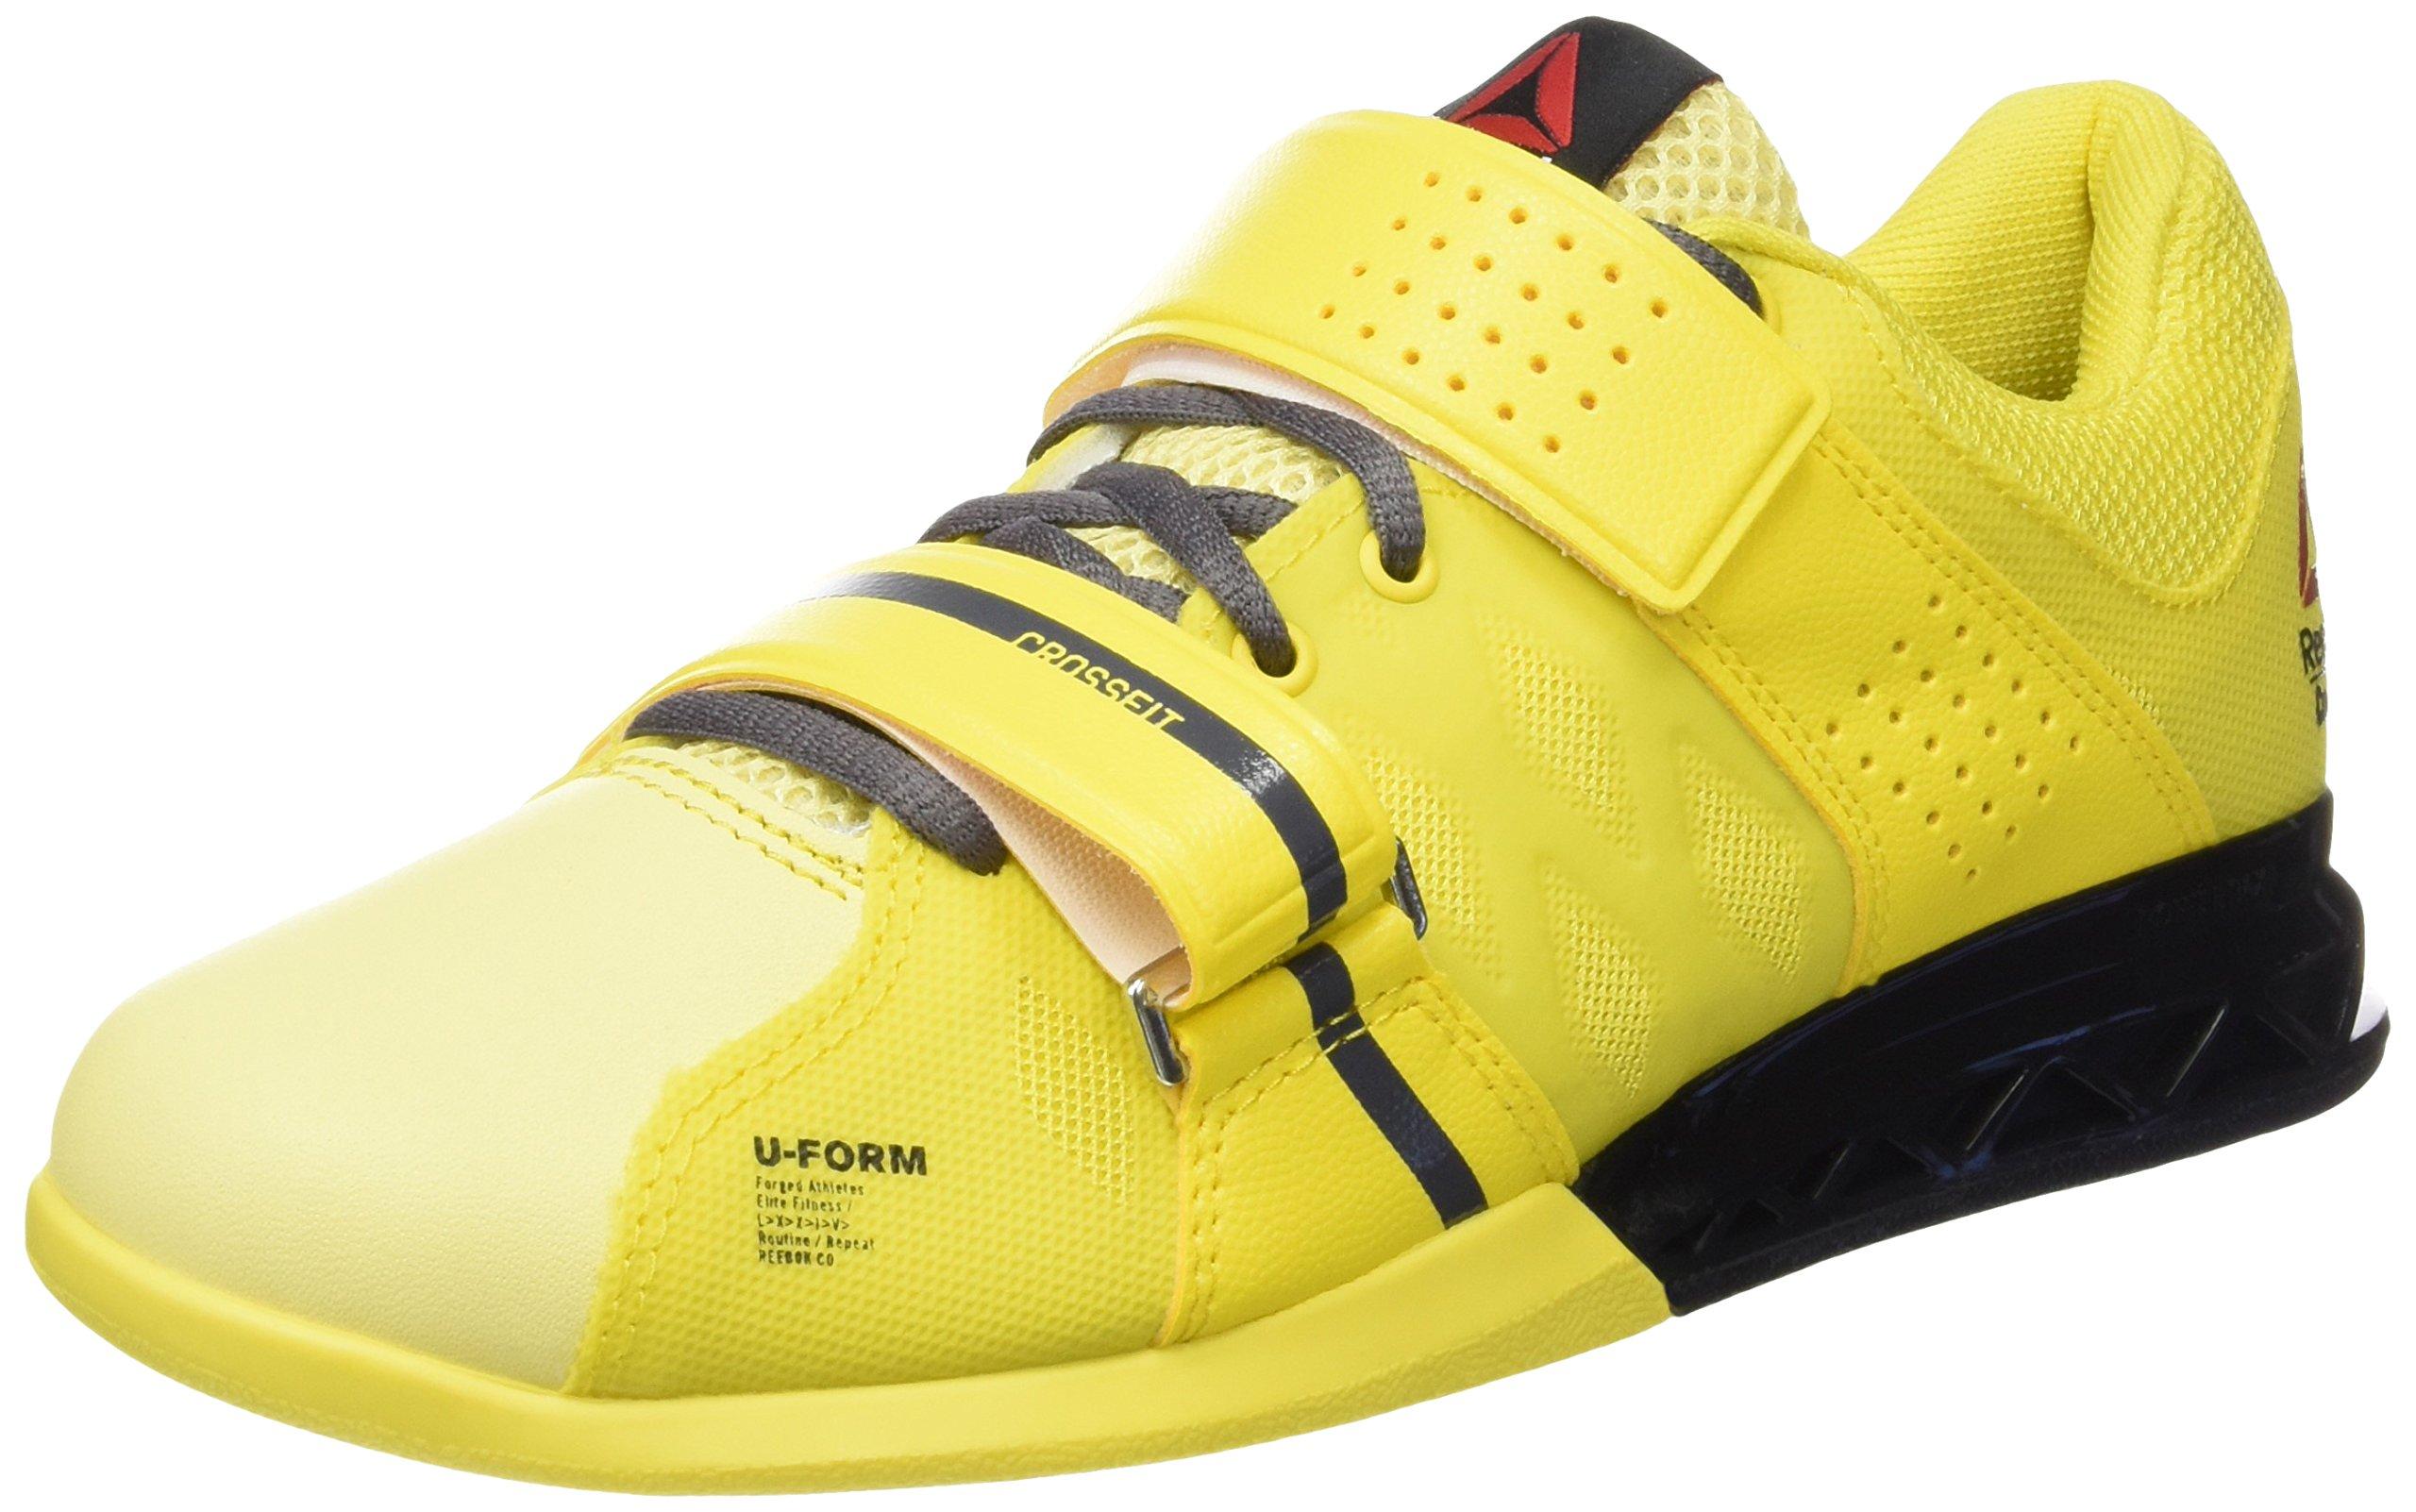 Reebok Crossfit Lifter Plus 2.0 Womens Running Trainers Sneakers (UK 5.5 us 8 EU 38.5, yellow grey black V72386)